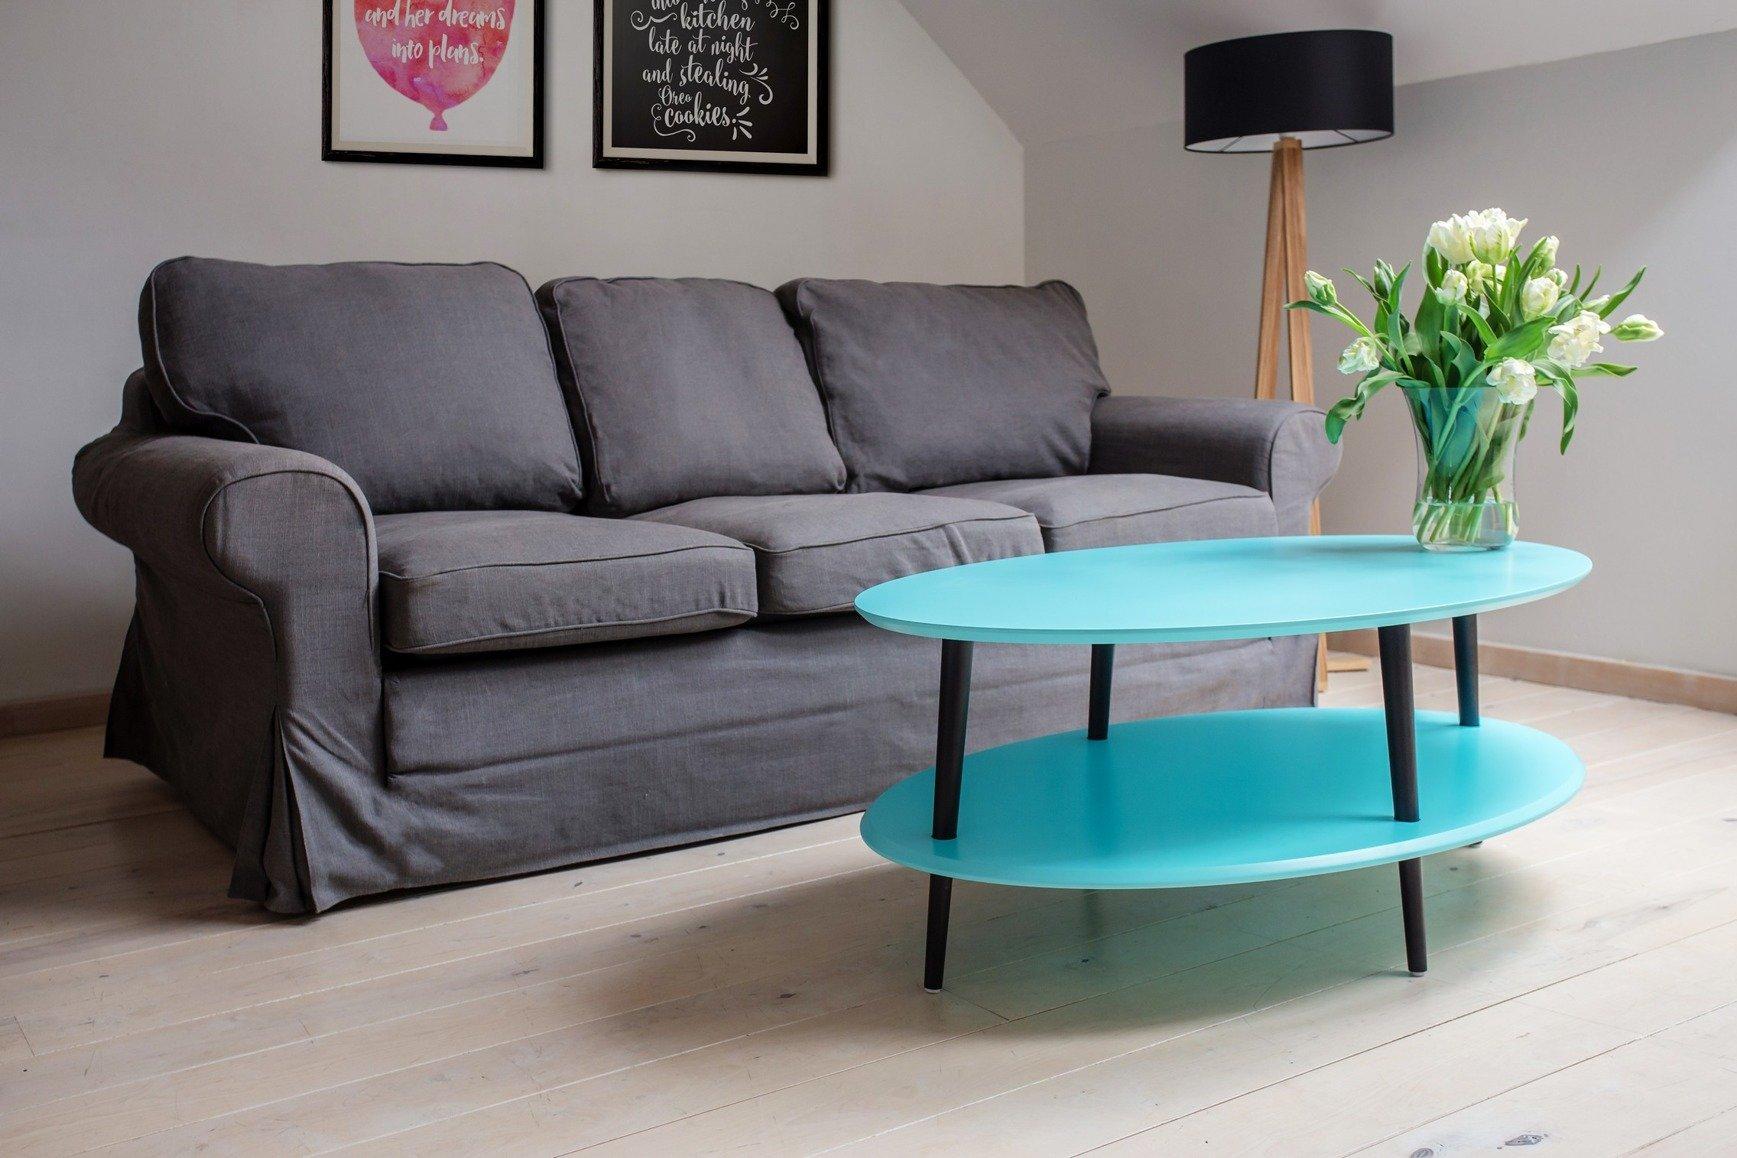 OVO low Coffee Table - yellow yellow \\ 25cm   Furniture \\ Coffee Tables